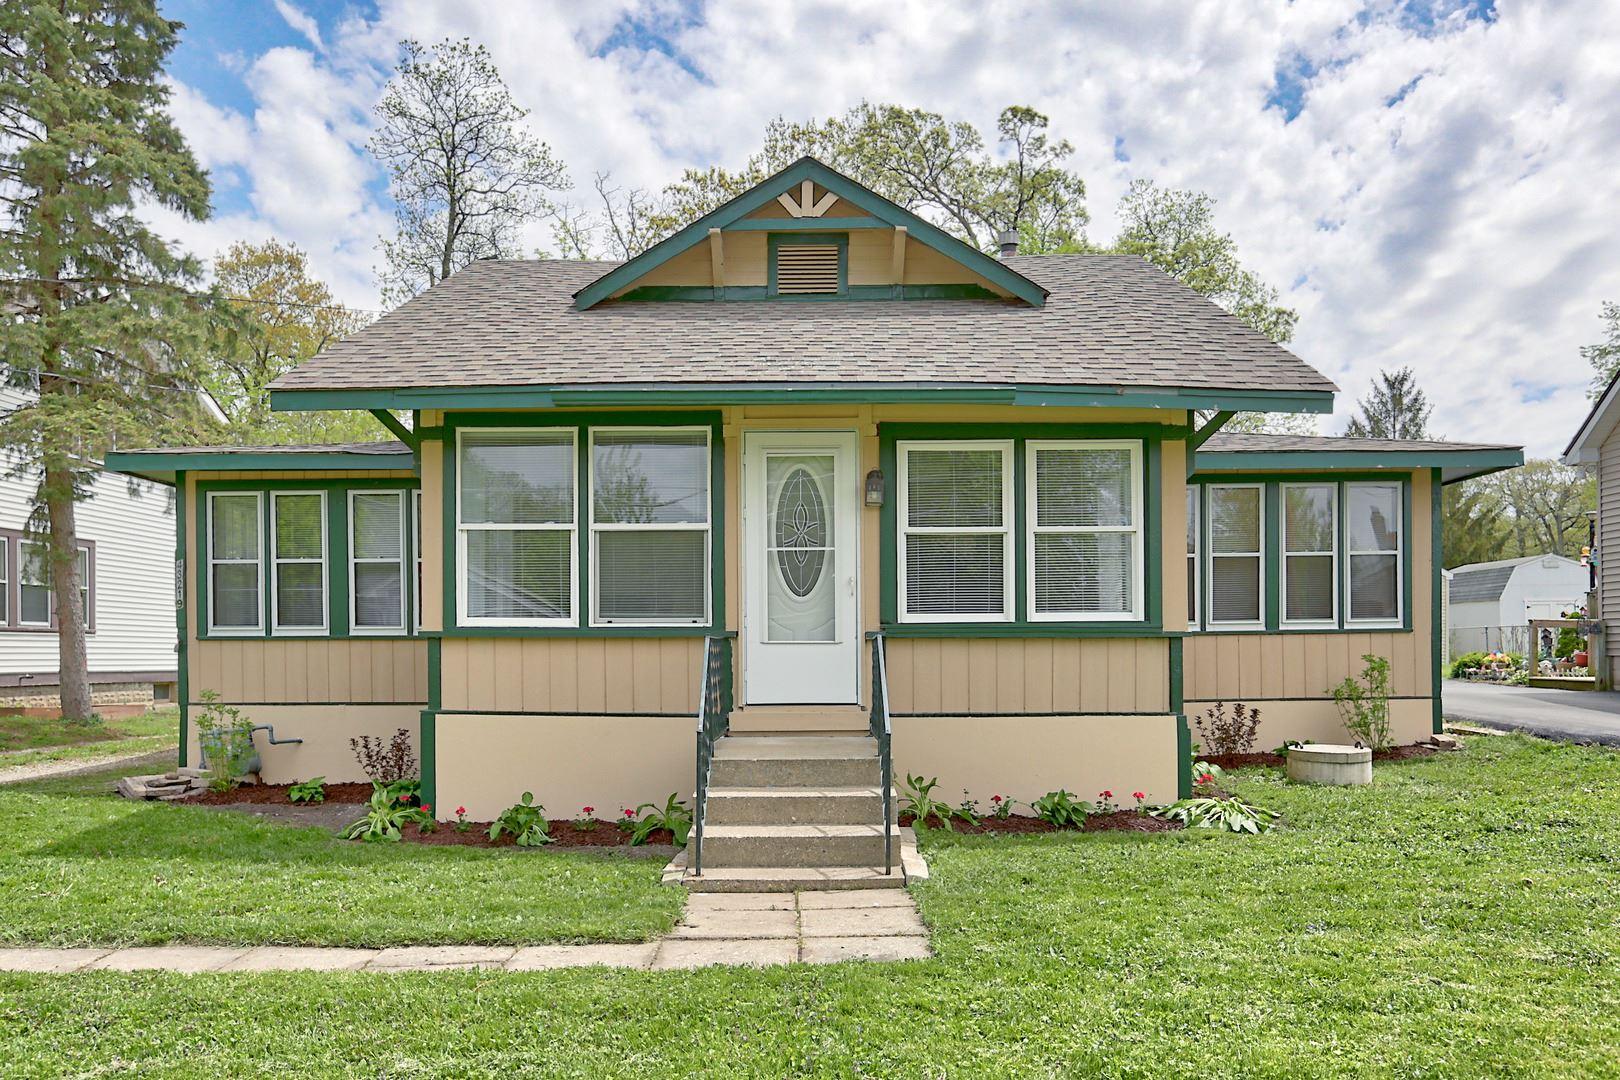 43219 N Lakeside Drive, Antioch, IL 60002 - #: 10813500